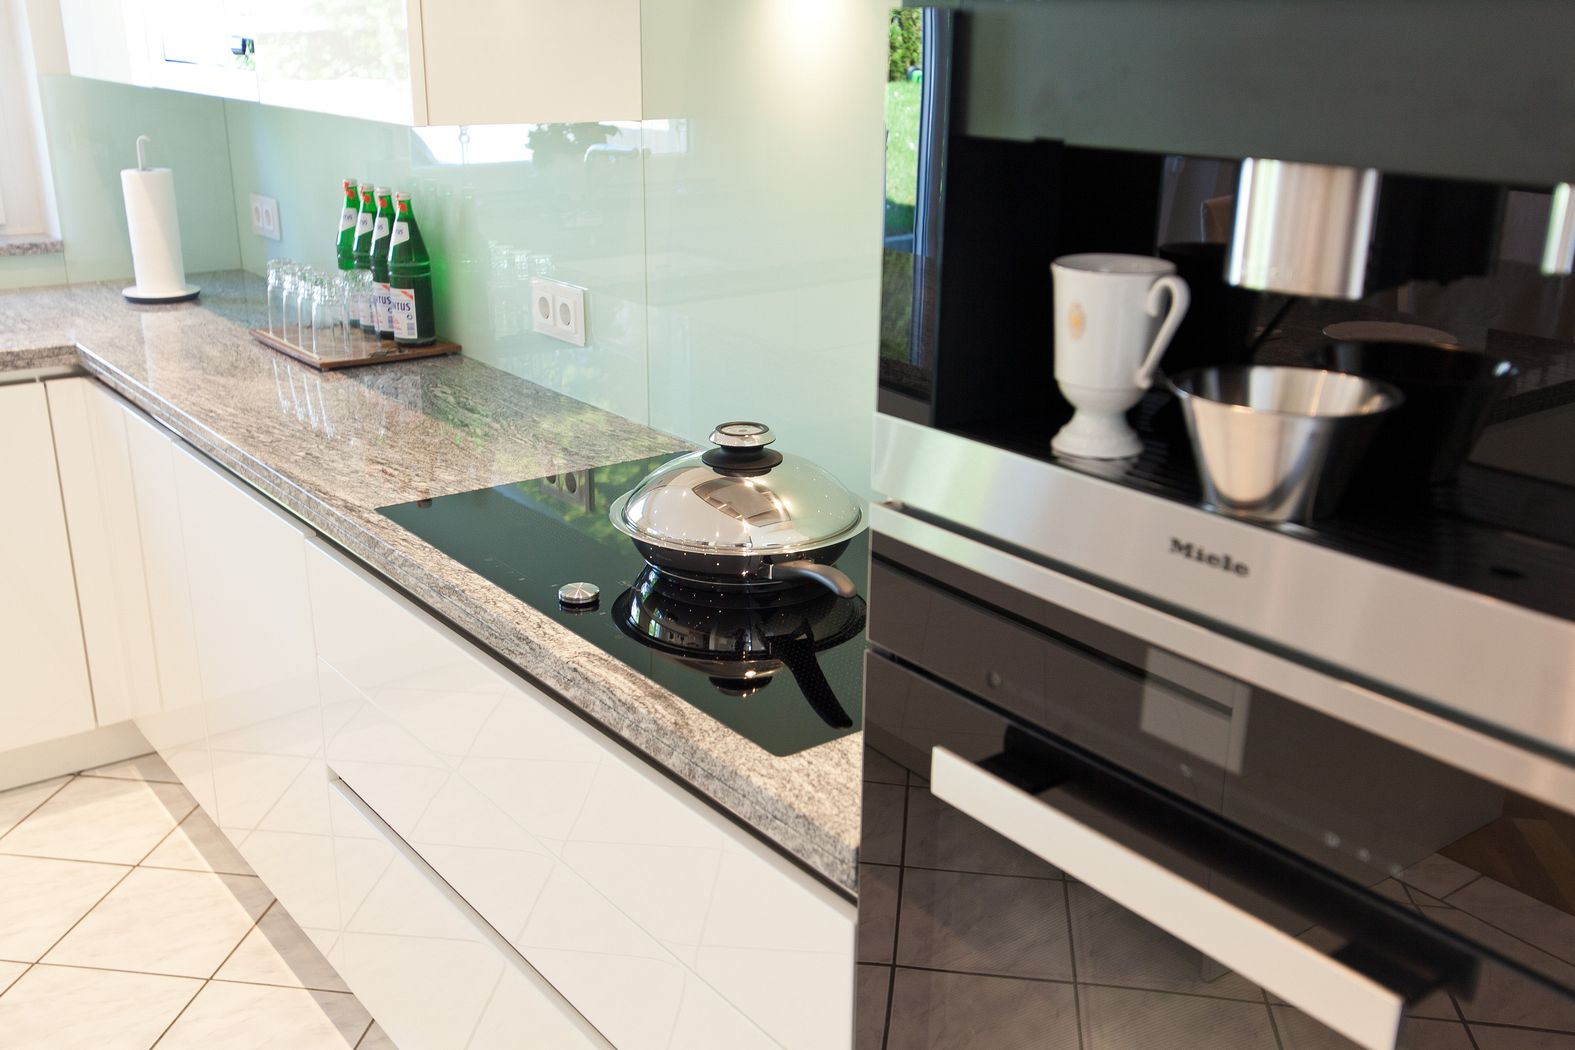 Full Size of Granit Arbeitsplatte Mit Weien Fronten Moderne Klassik Kche Granitplatten Küche Sideboard Arbeitsplatten Wohnzimmer Granit Arbeitsplatte